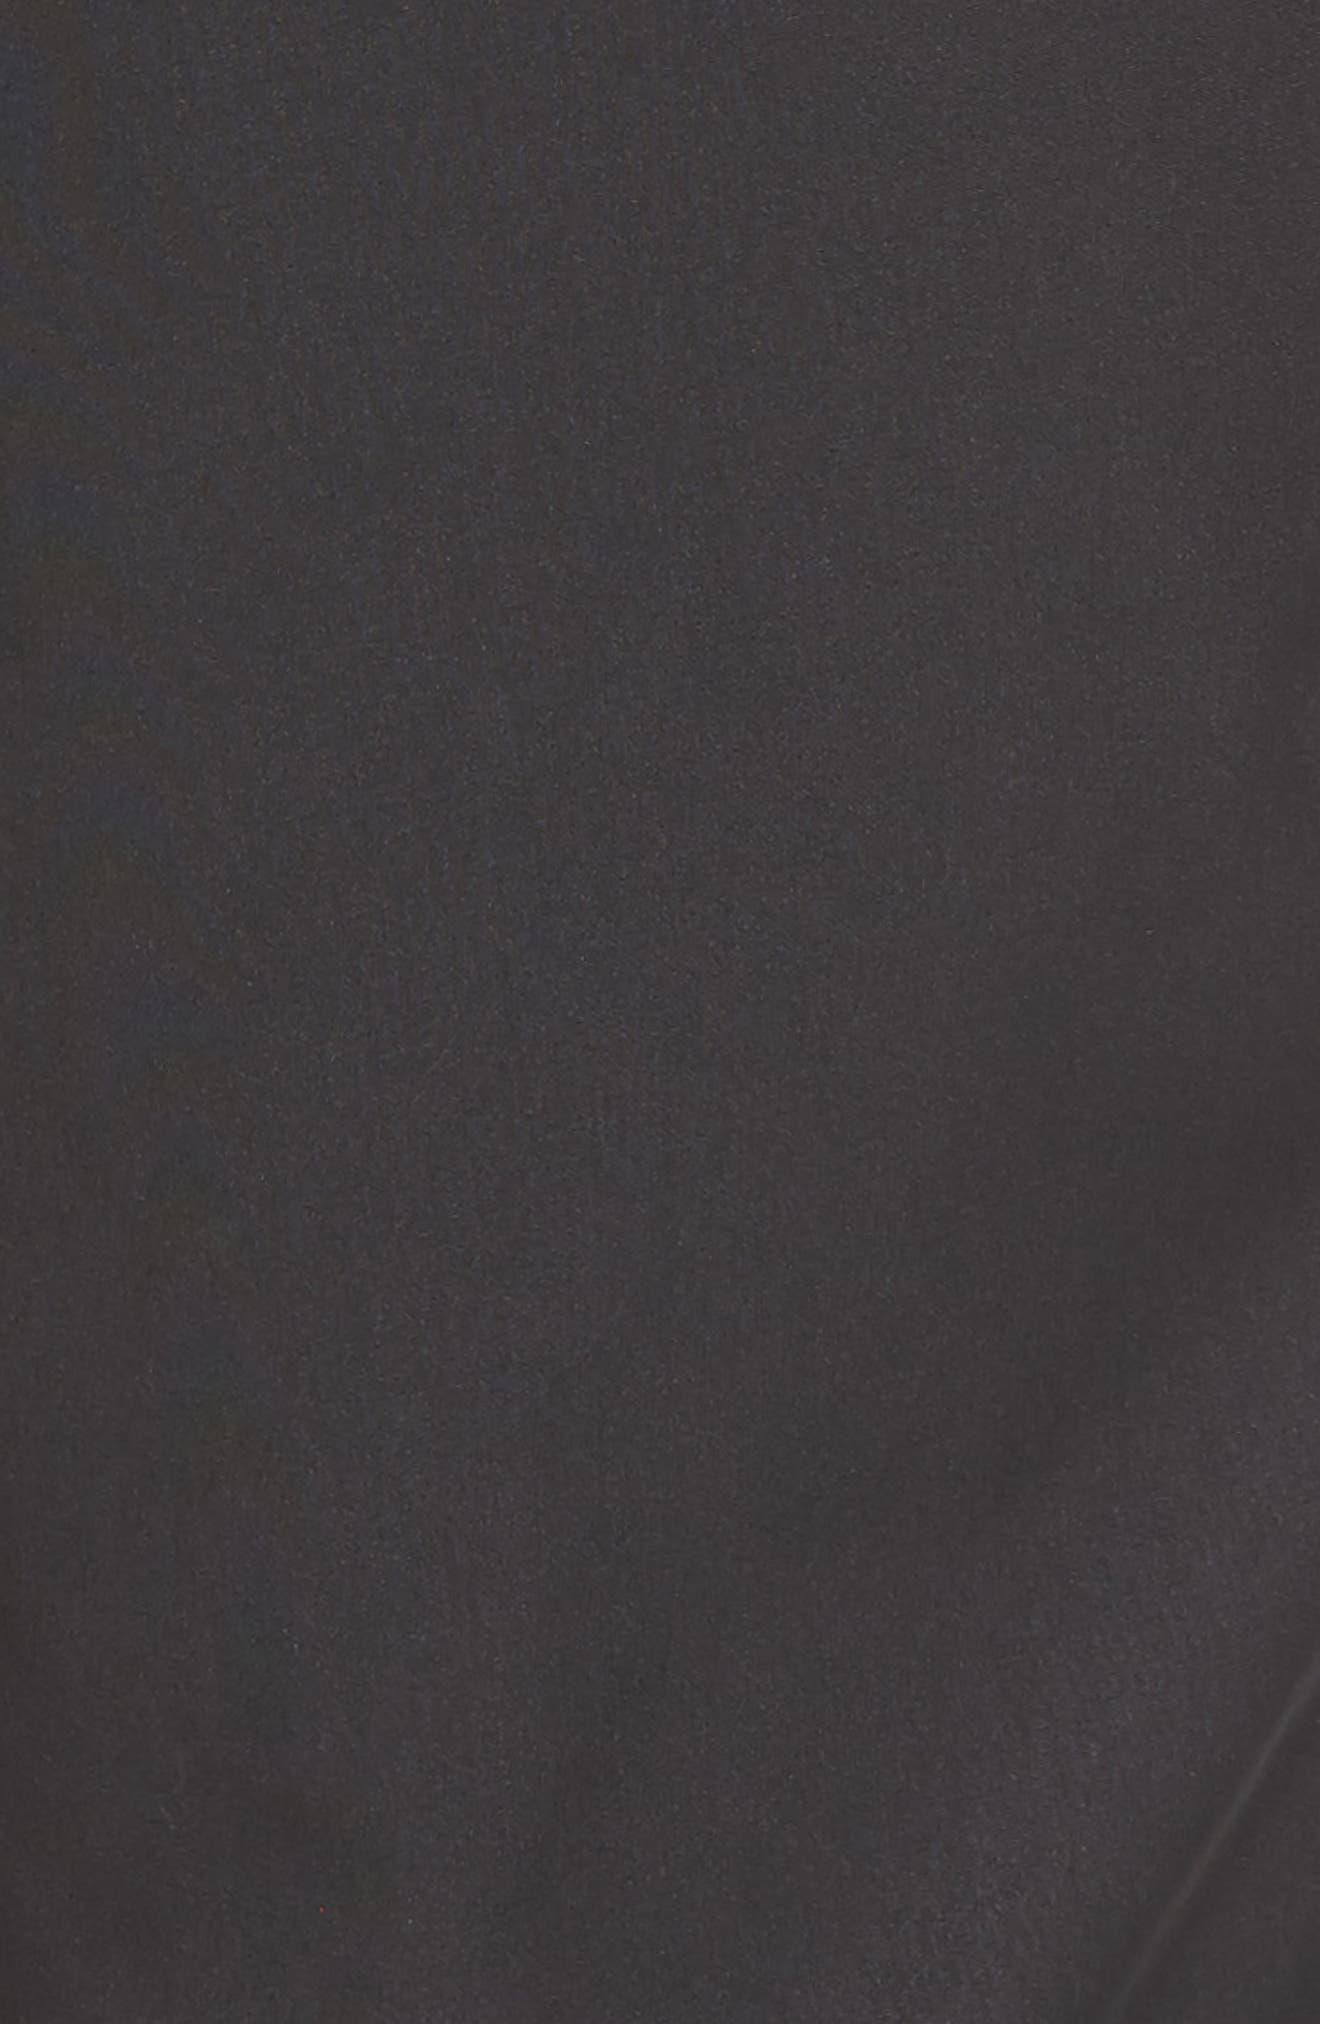 NSW Archive Pants,                             Alternate thumbnail 5, color,                             BLACK/ SAIL/ SAIL/ SAIL